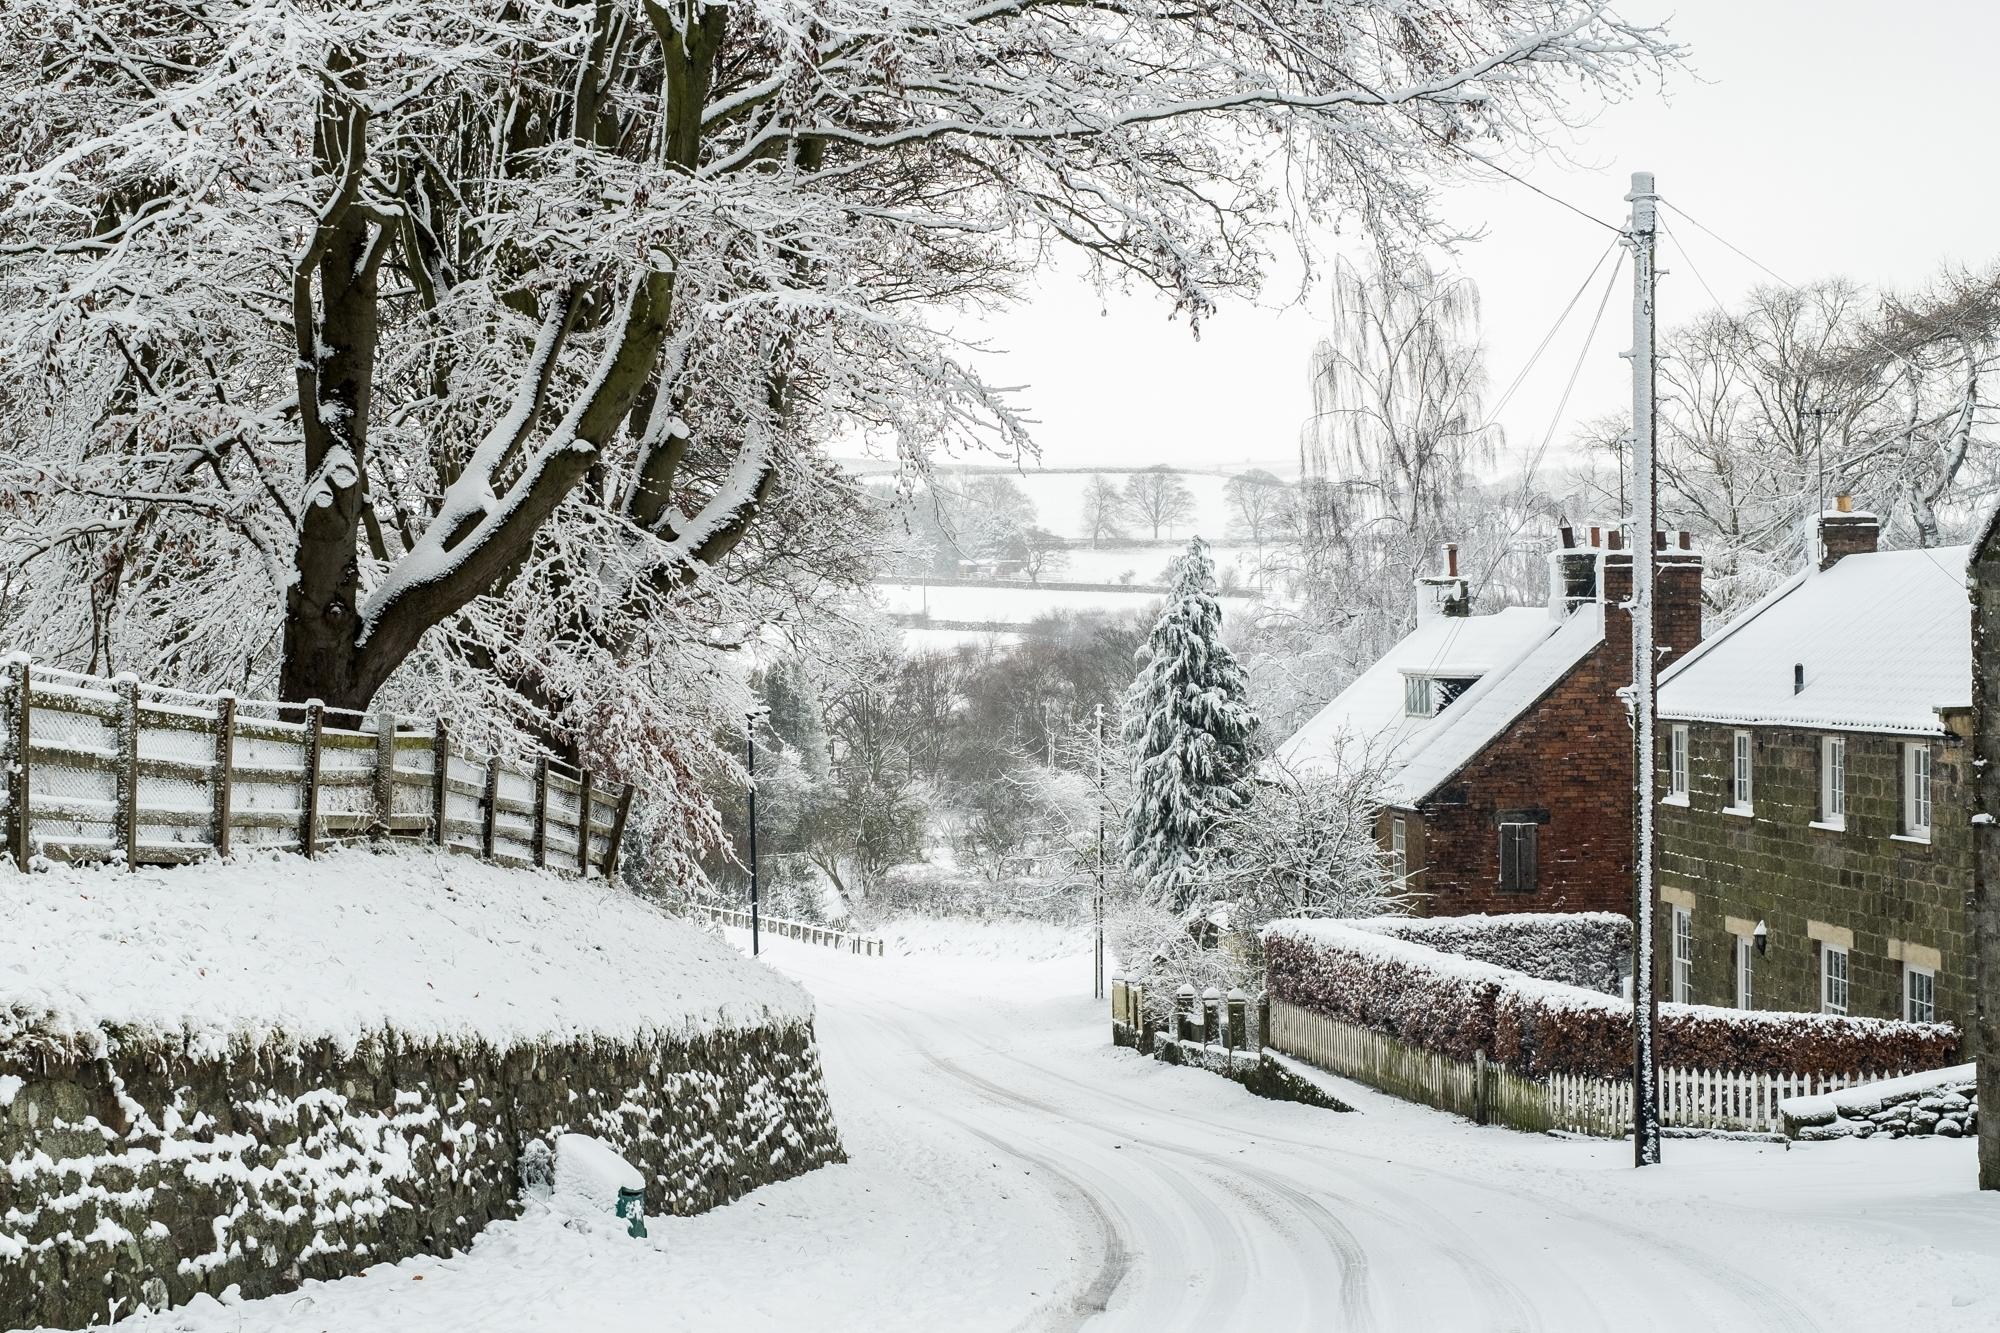 ainthorpe village snow scenes - danby, north york moors a5 christmas